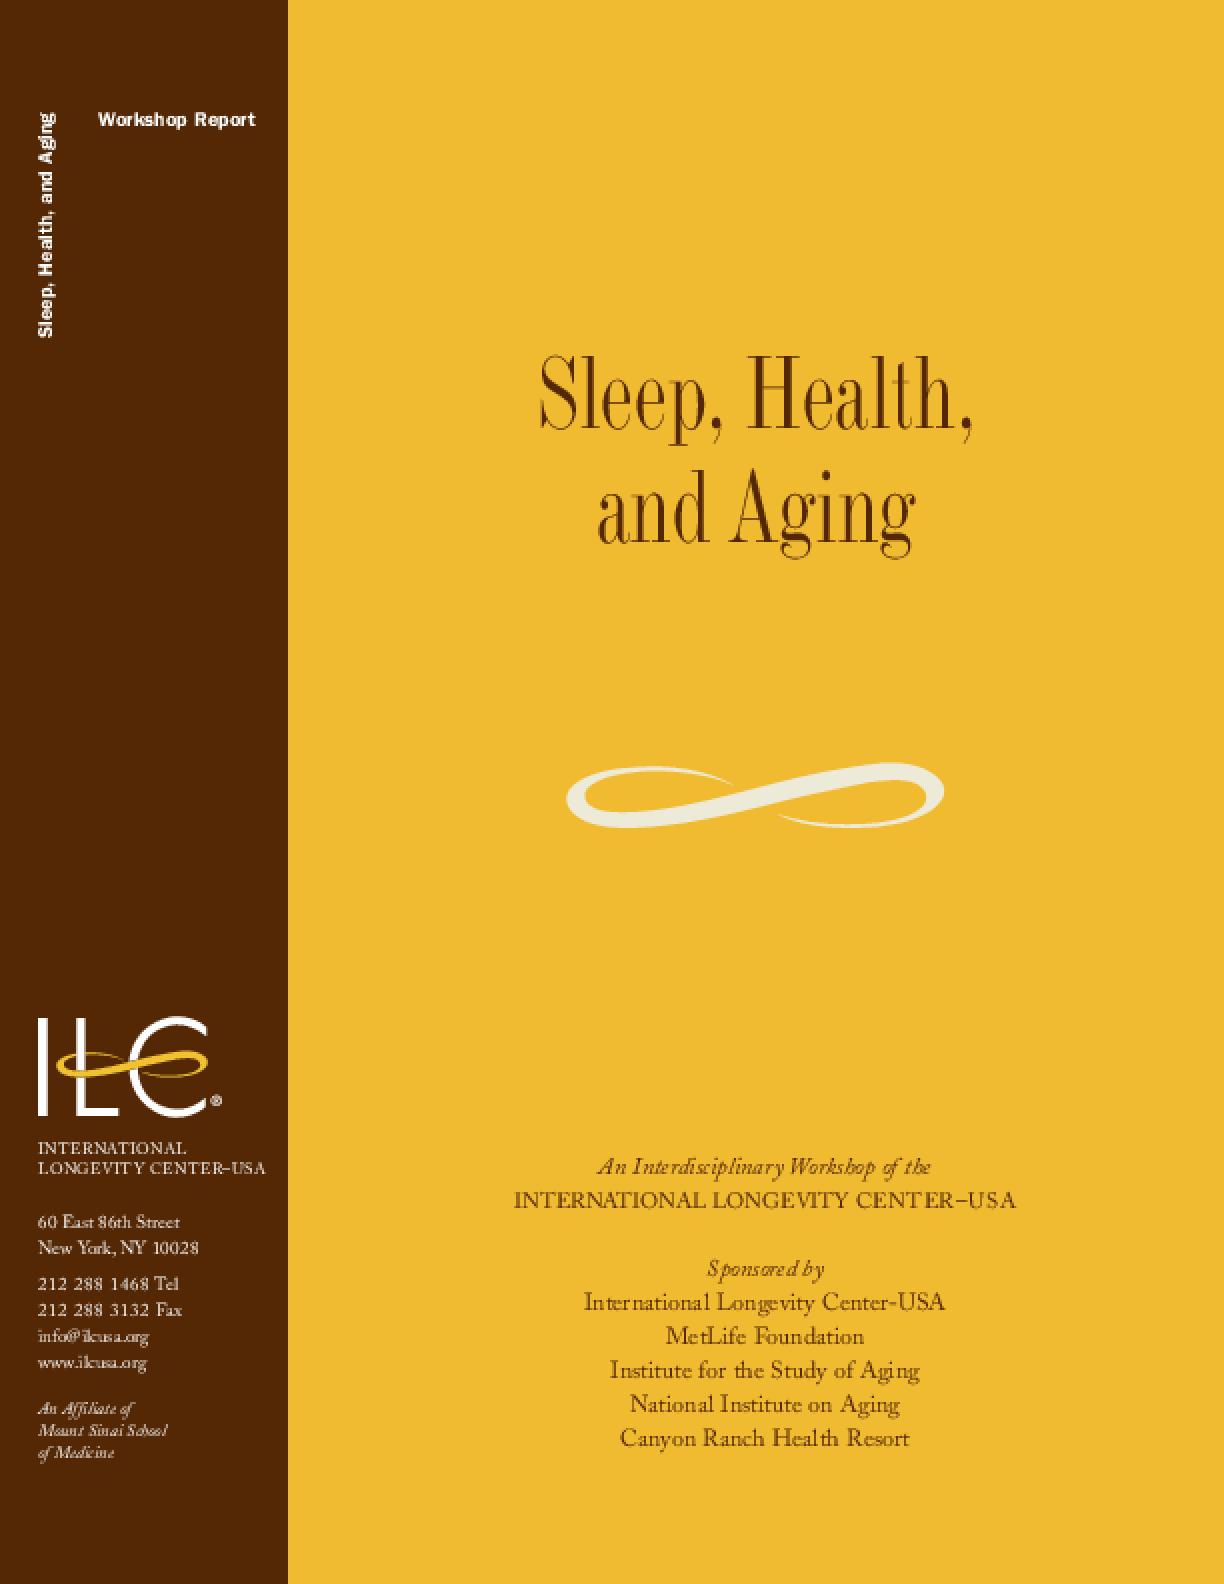 Sleep, Health, and Aging